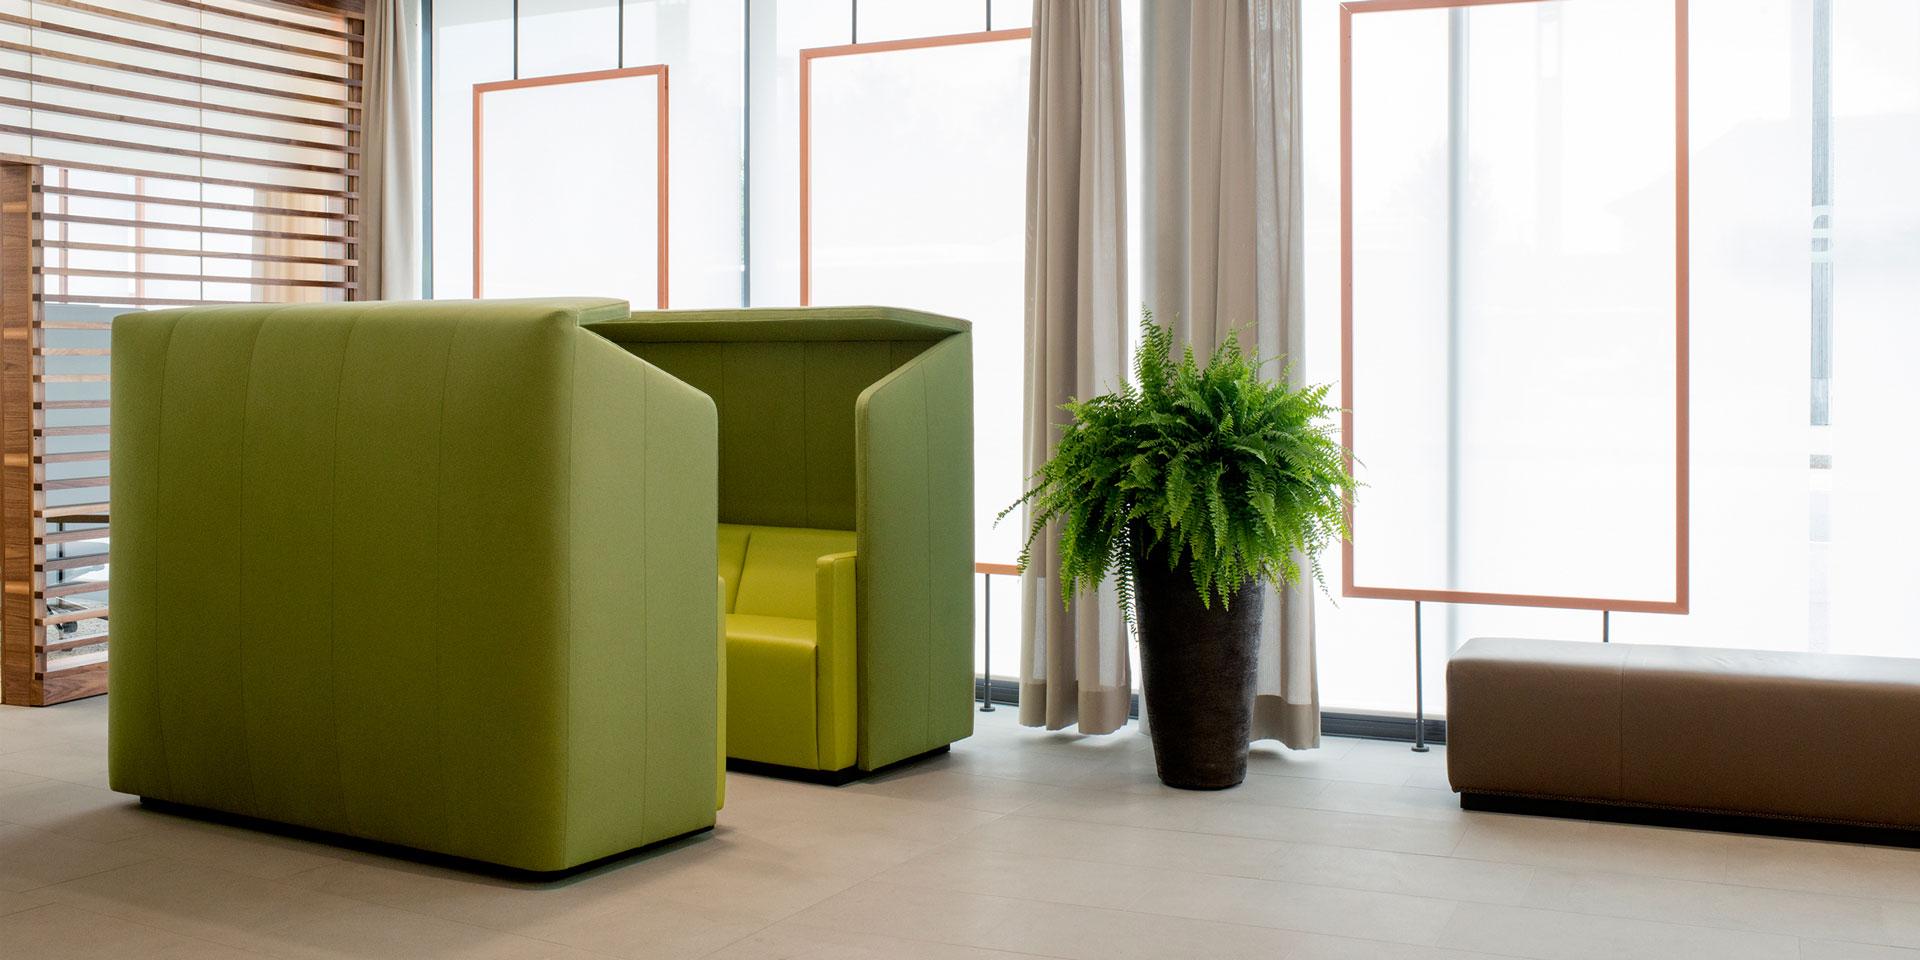 polster factory d pp polsterei schweiz polstergruppe neu beziehen polstergruppe neu beziehen. Black Bedroom Furniture Sets. Home Design Ideas